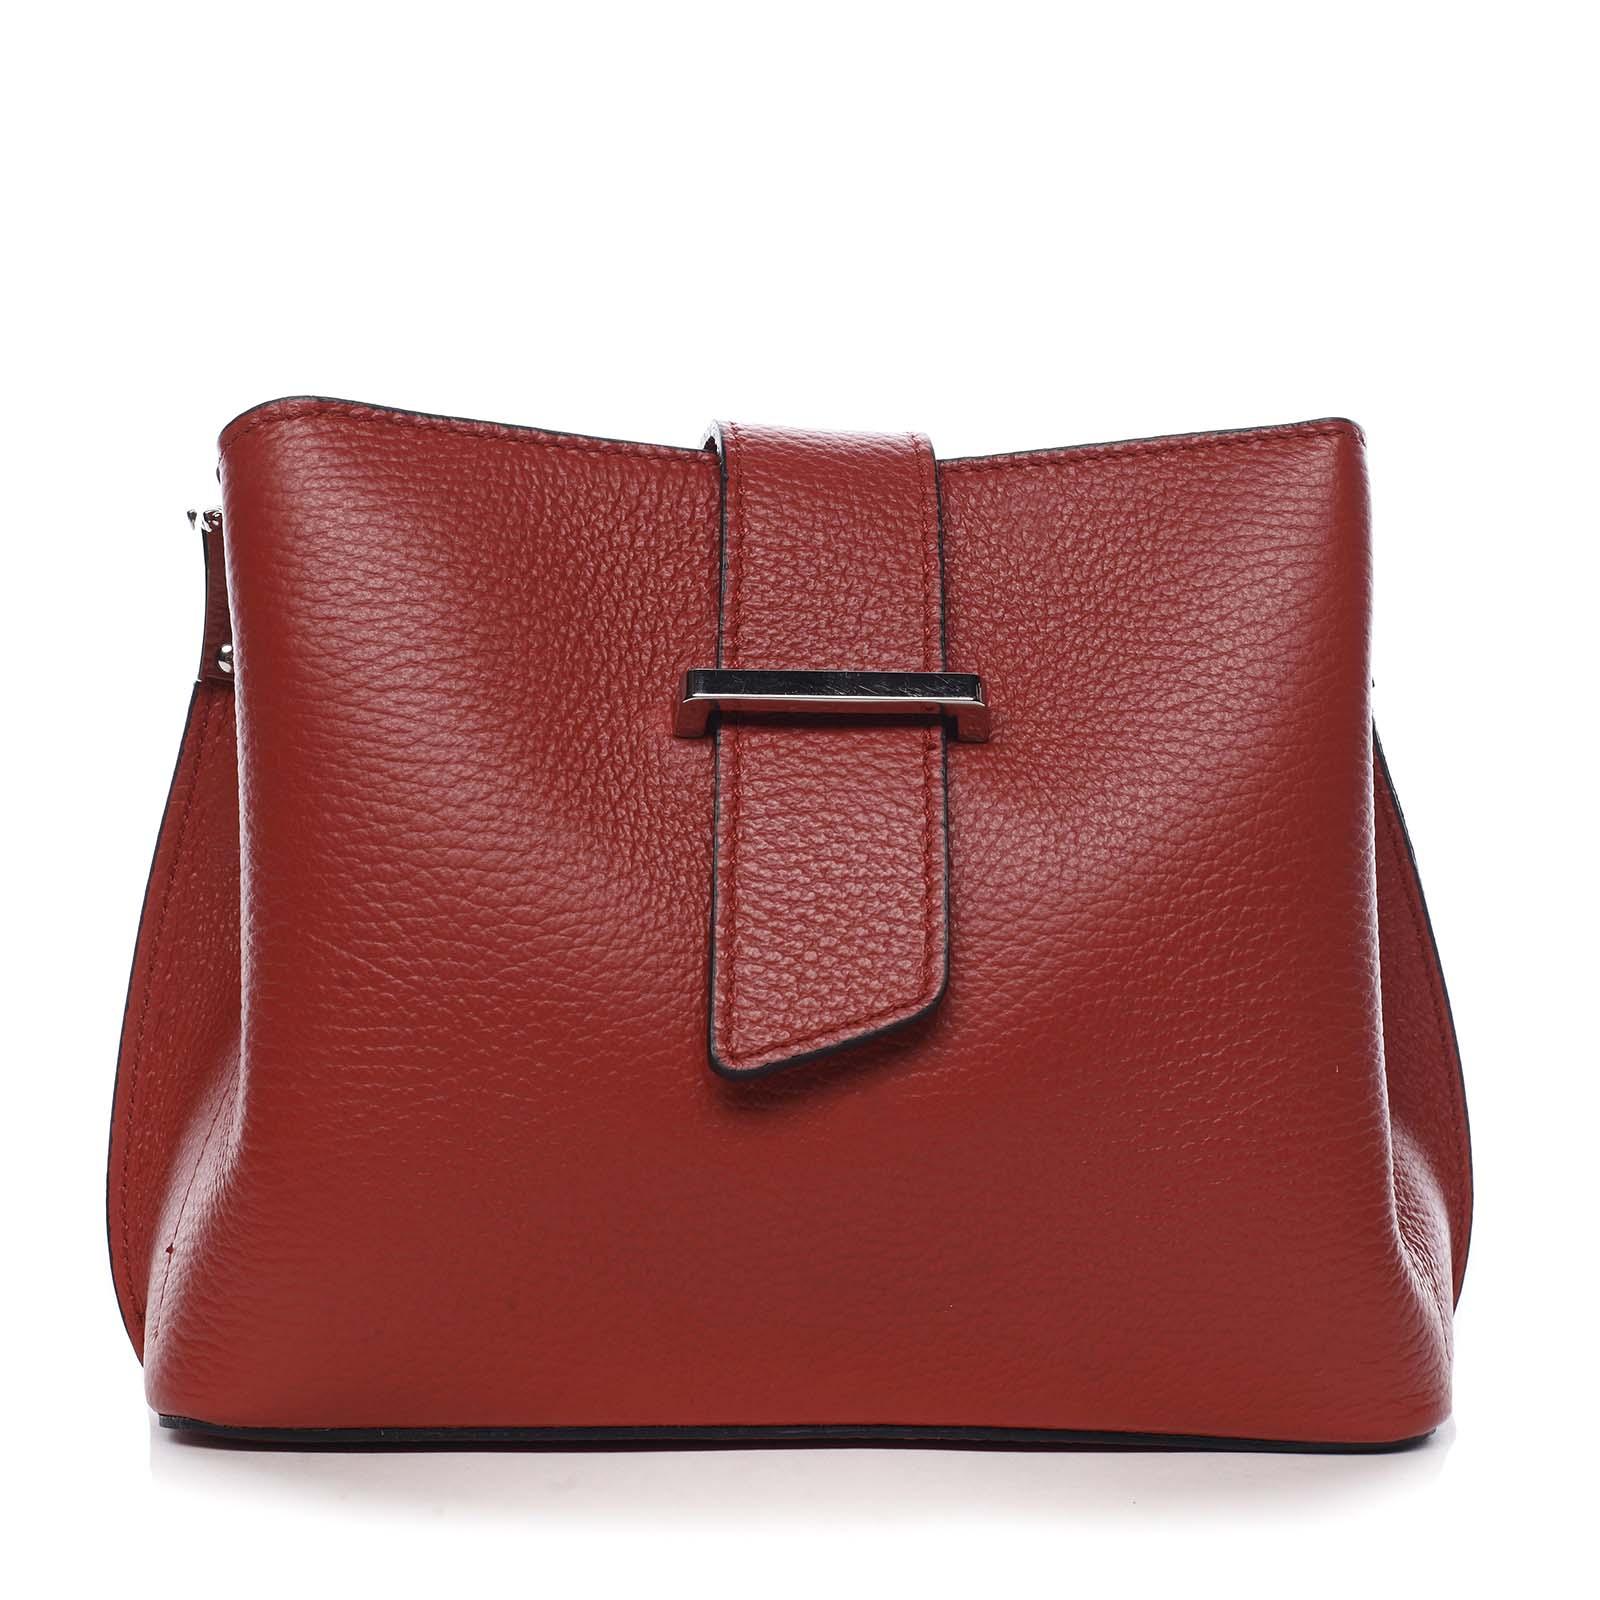 Dámska kožená crossbody kabelka červená - ItalY Euren